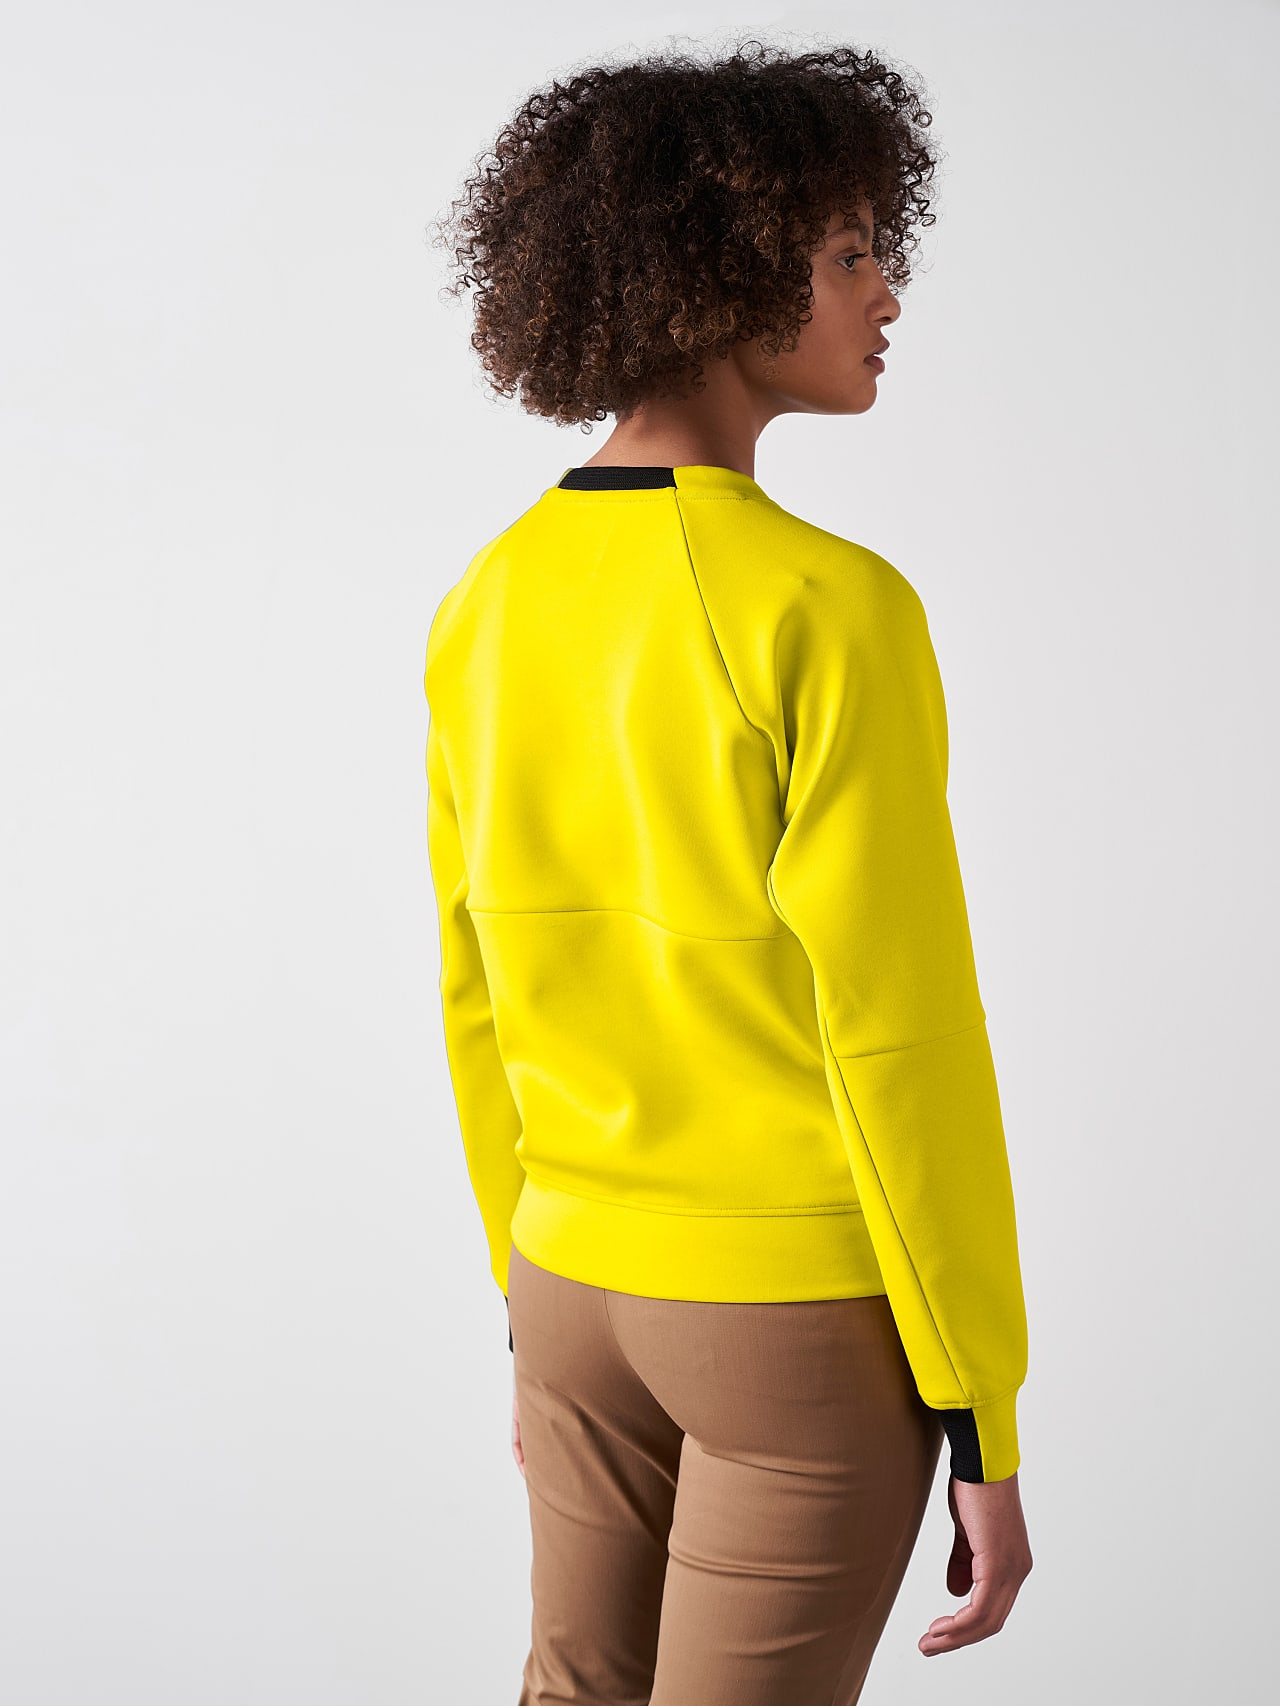 SINOV V1.Y5.01 Crewneck Sweater yellow Front Main Alpha Tauri